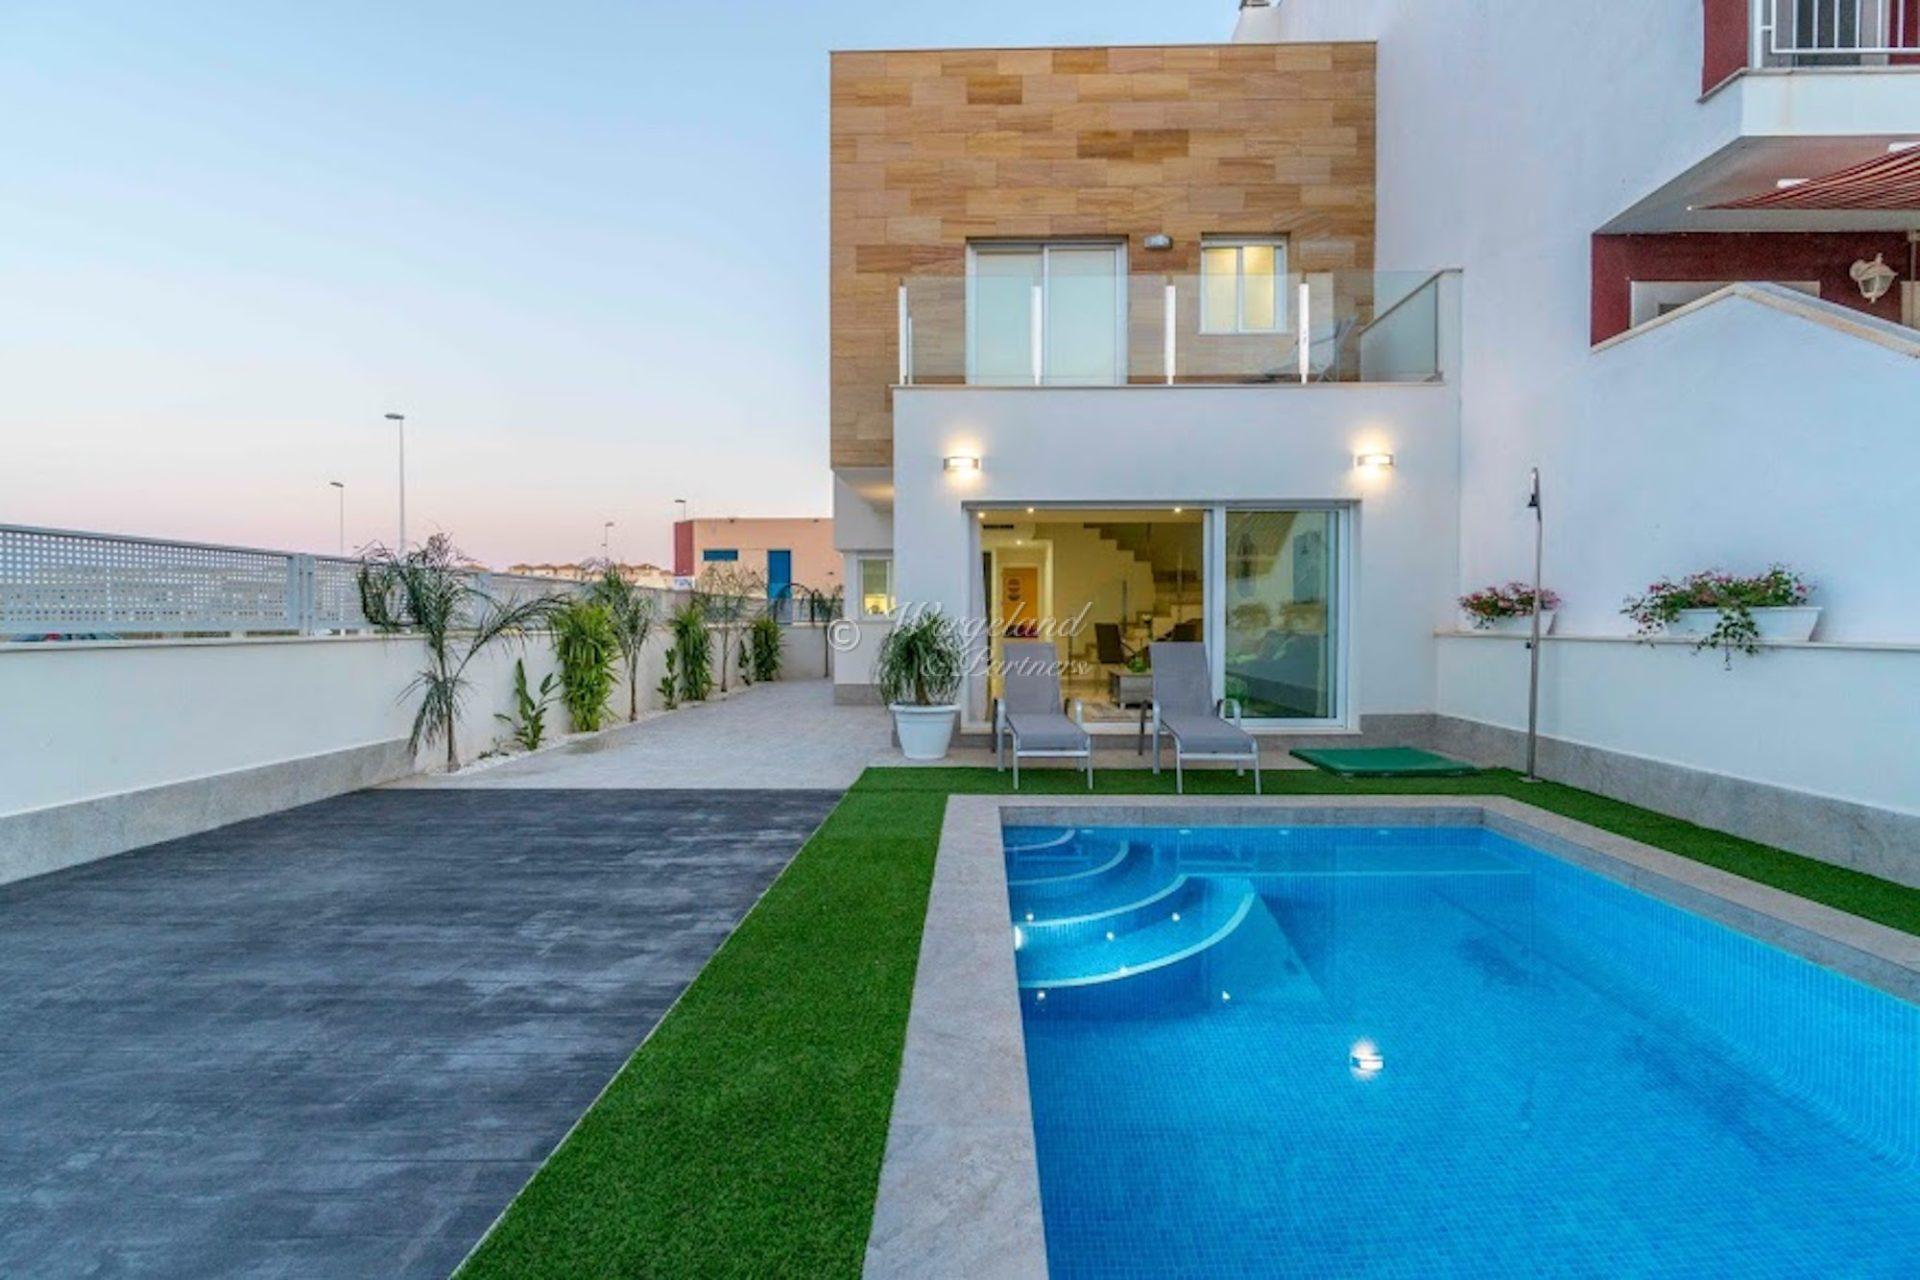 Se prisen! Siste sydvendte 3 soveroms bolig med takterrasse og privat basseng [RB11]